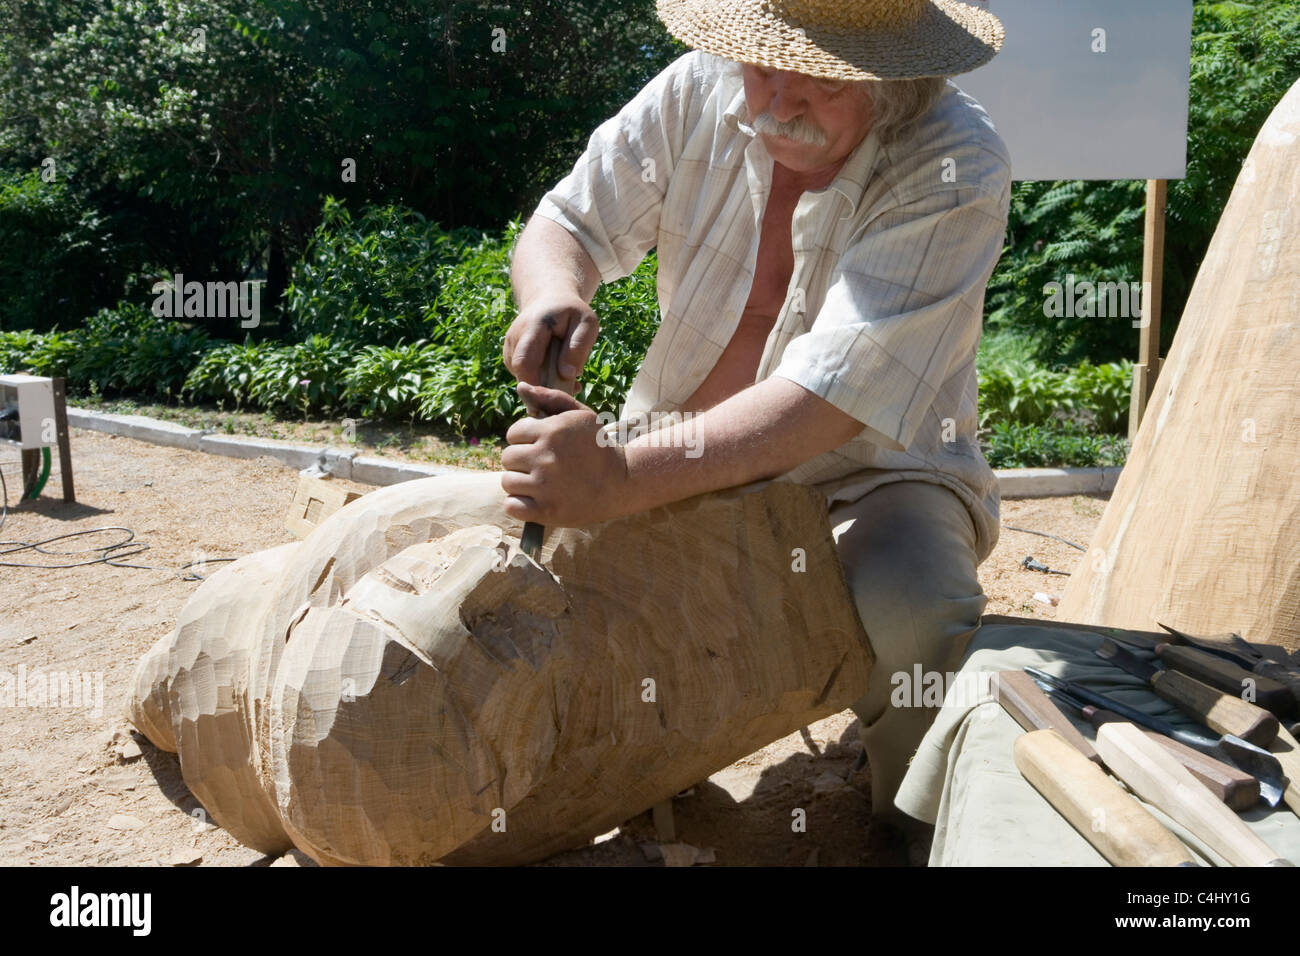 A sculptor creates a wooden sculpture - Stock Image